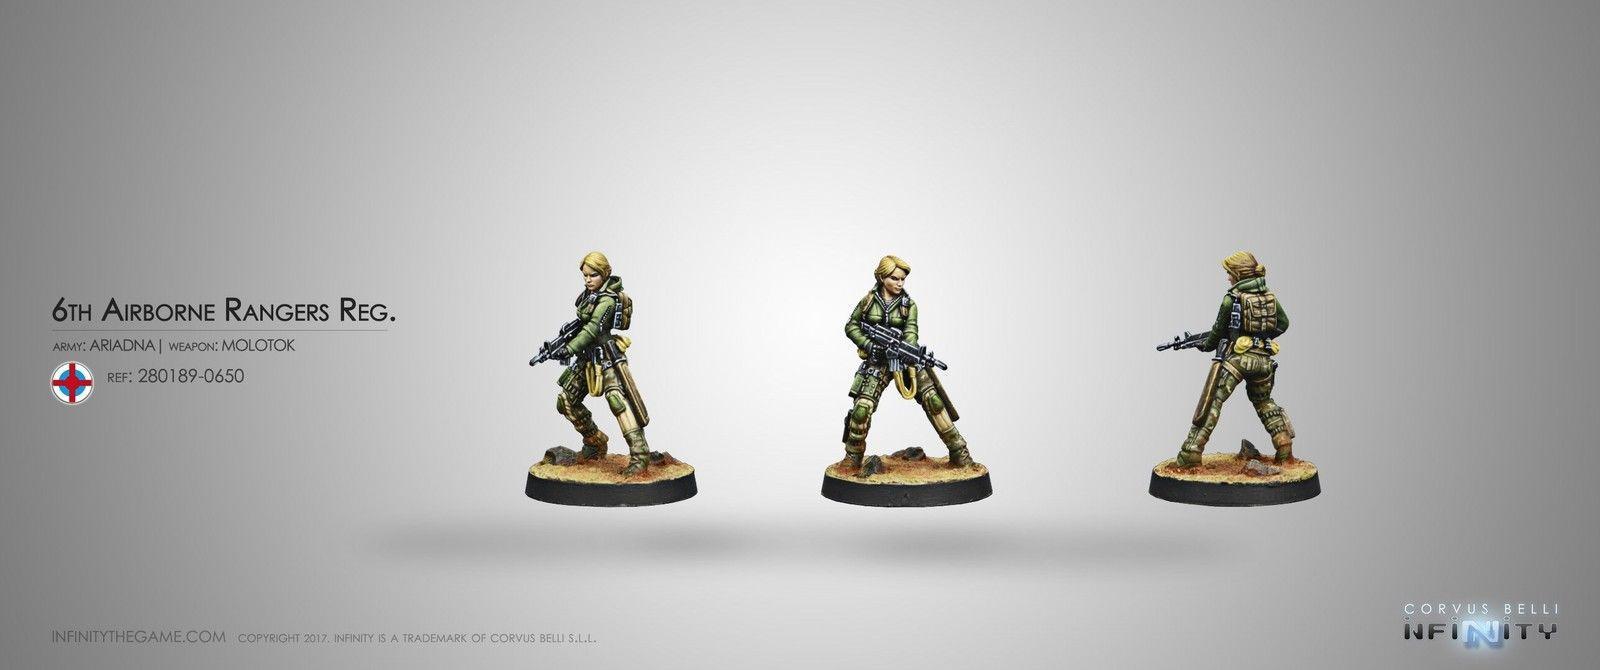 6th Airborne Ranger Reg. (Molotok)